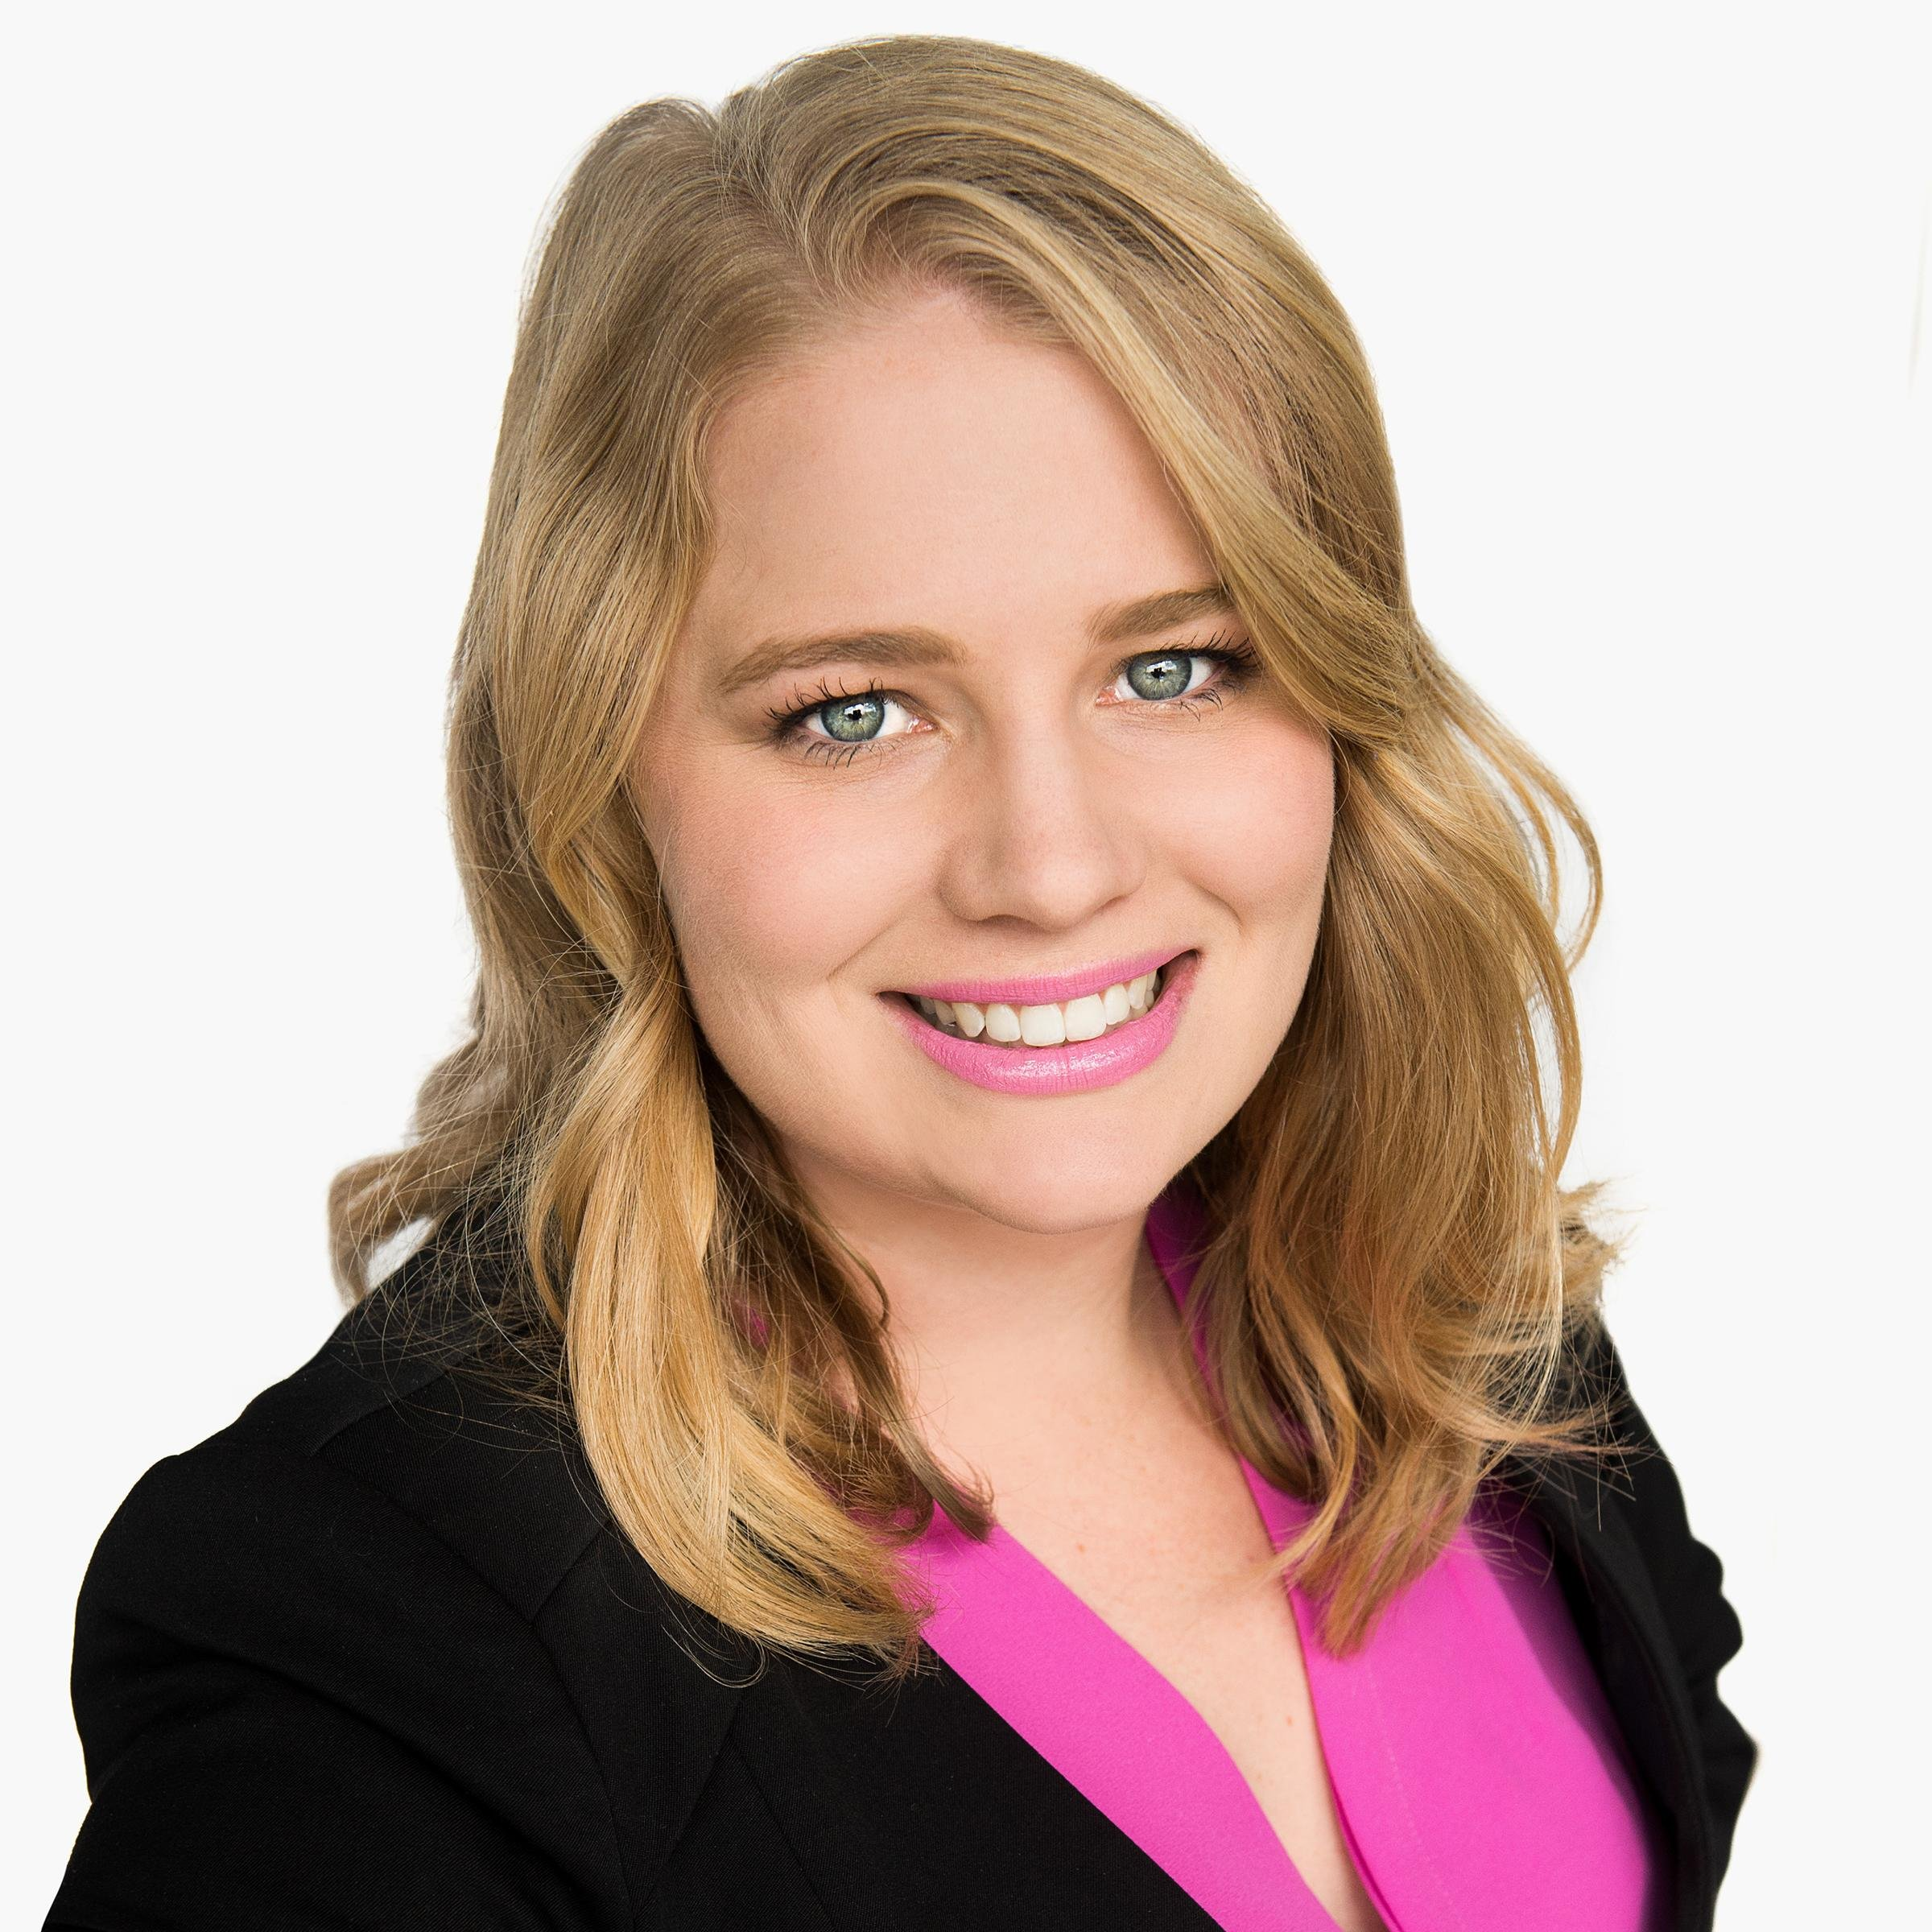 Katie Hamilton